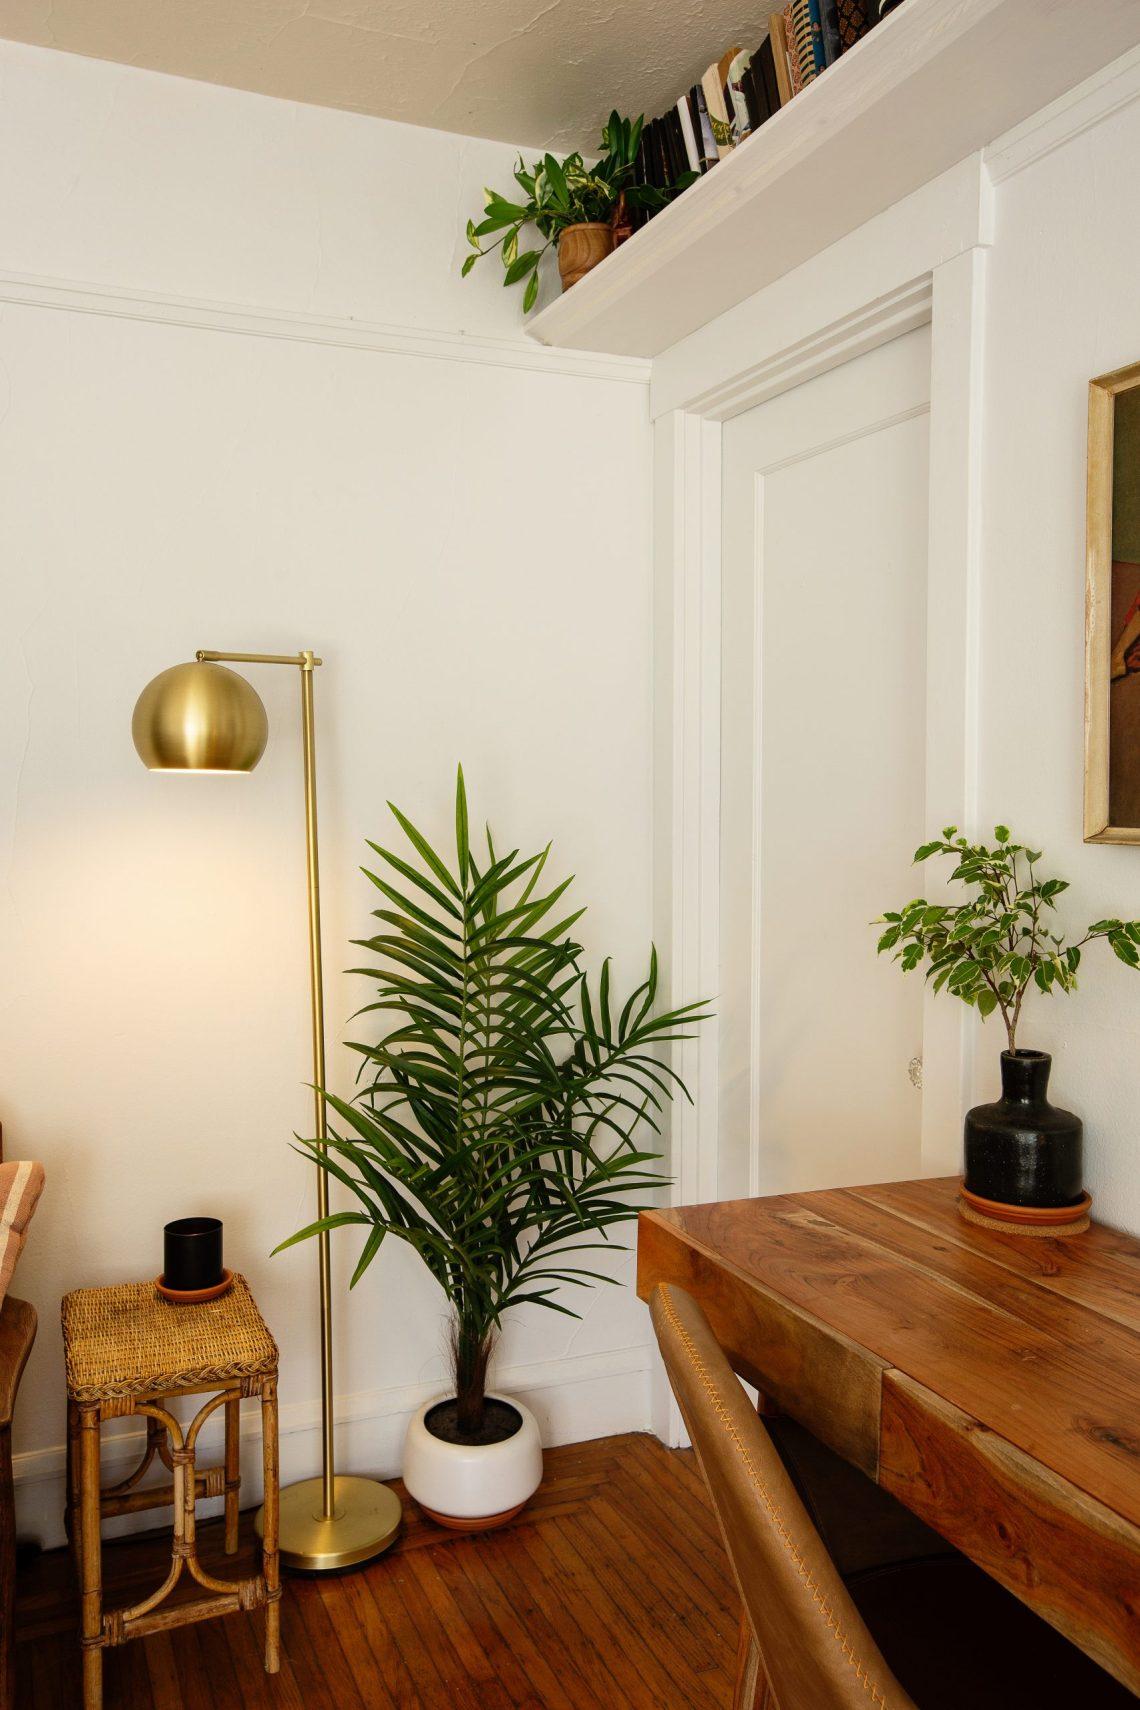 Interiors photographer Ella Sophie captures details of a Carrie Burch studio